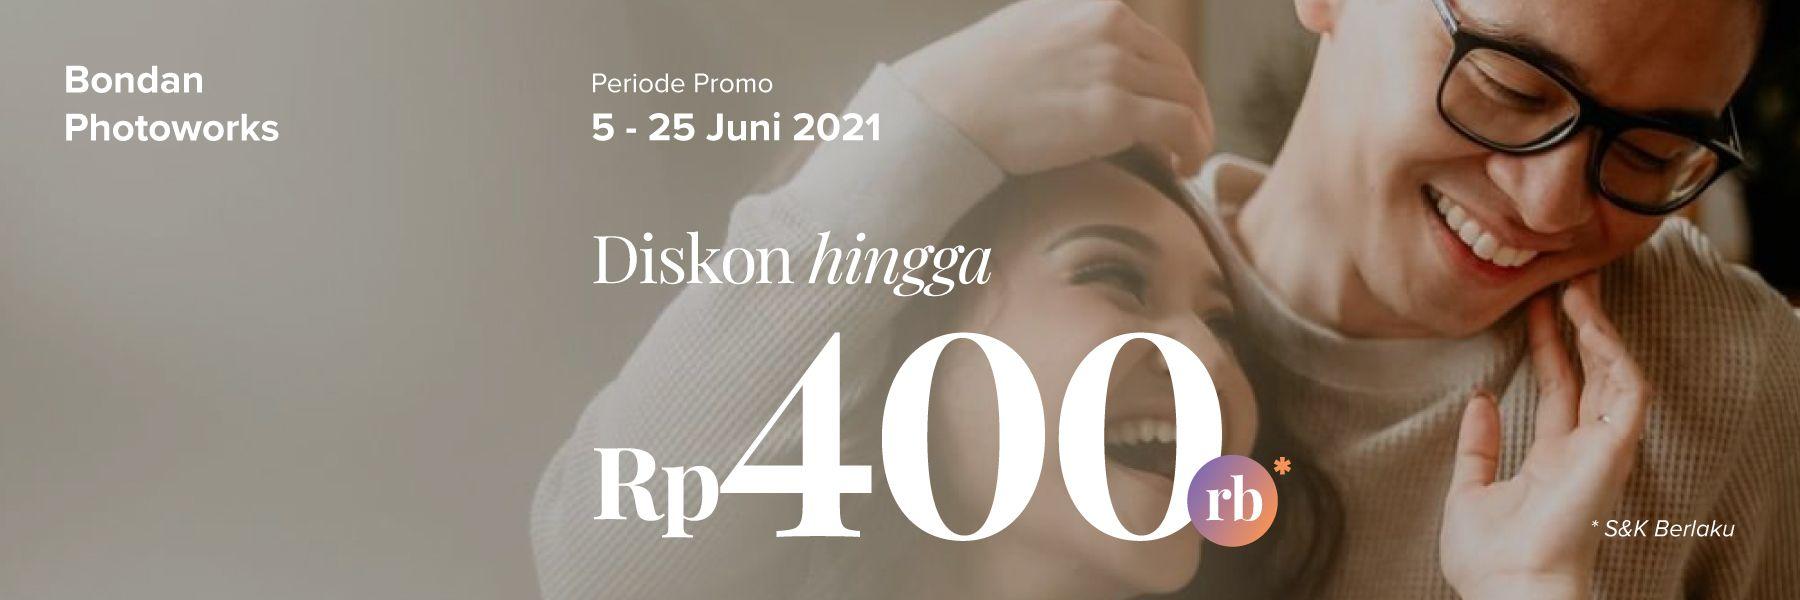 Promo Photography. Diskon Prewedding 5% di Bondan Photoworks